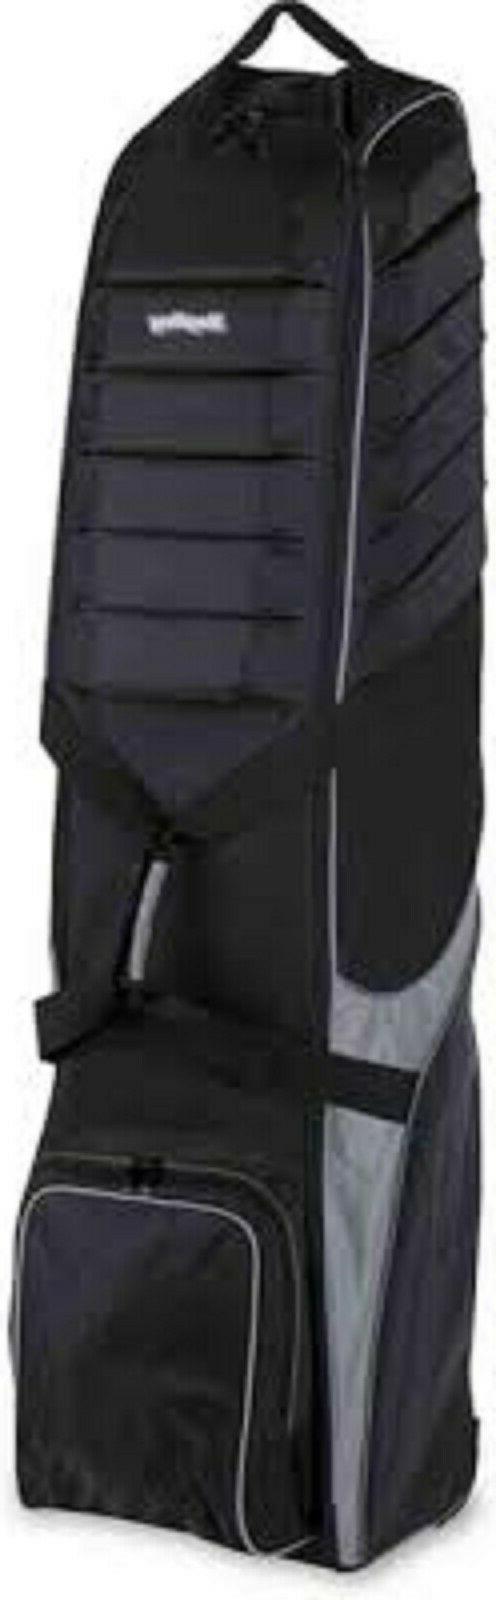 Bag Boy T-750 Wheeled Travel Cover Black/Charcoal